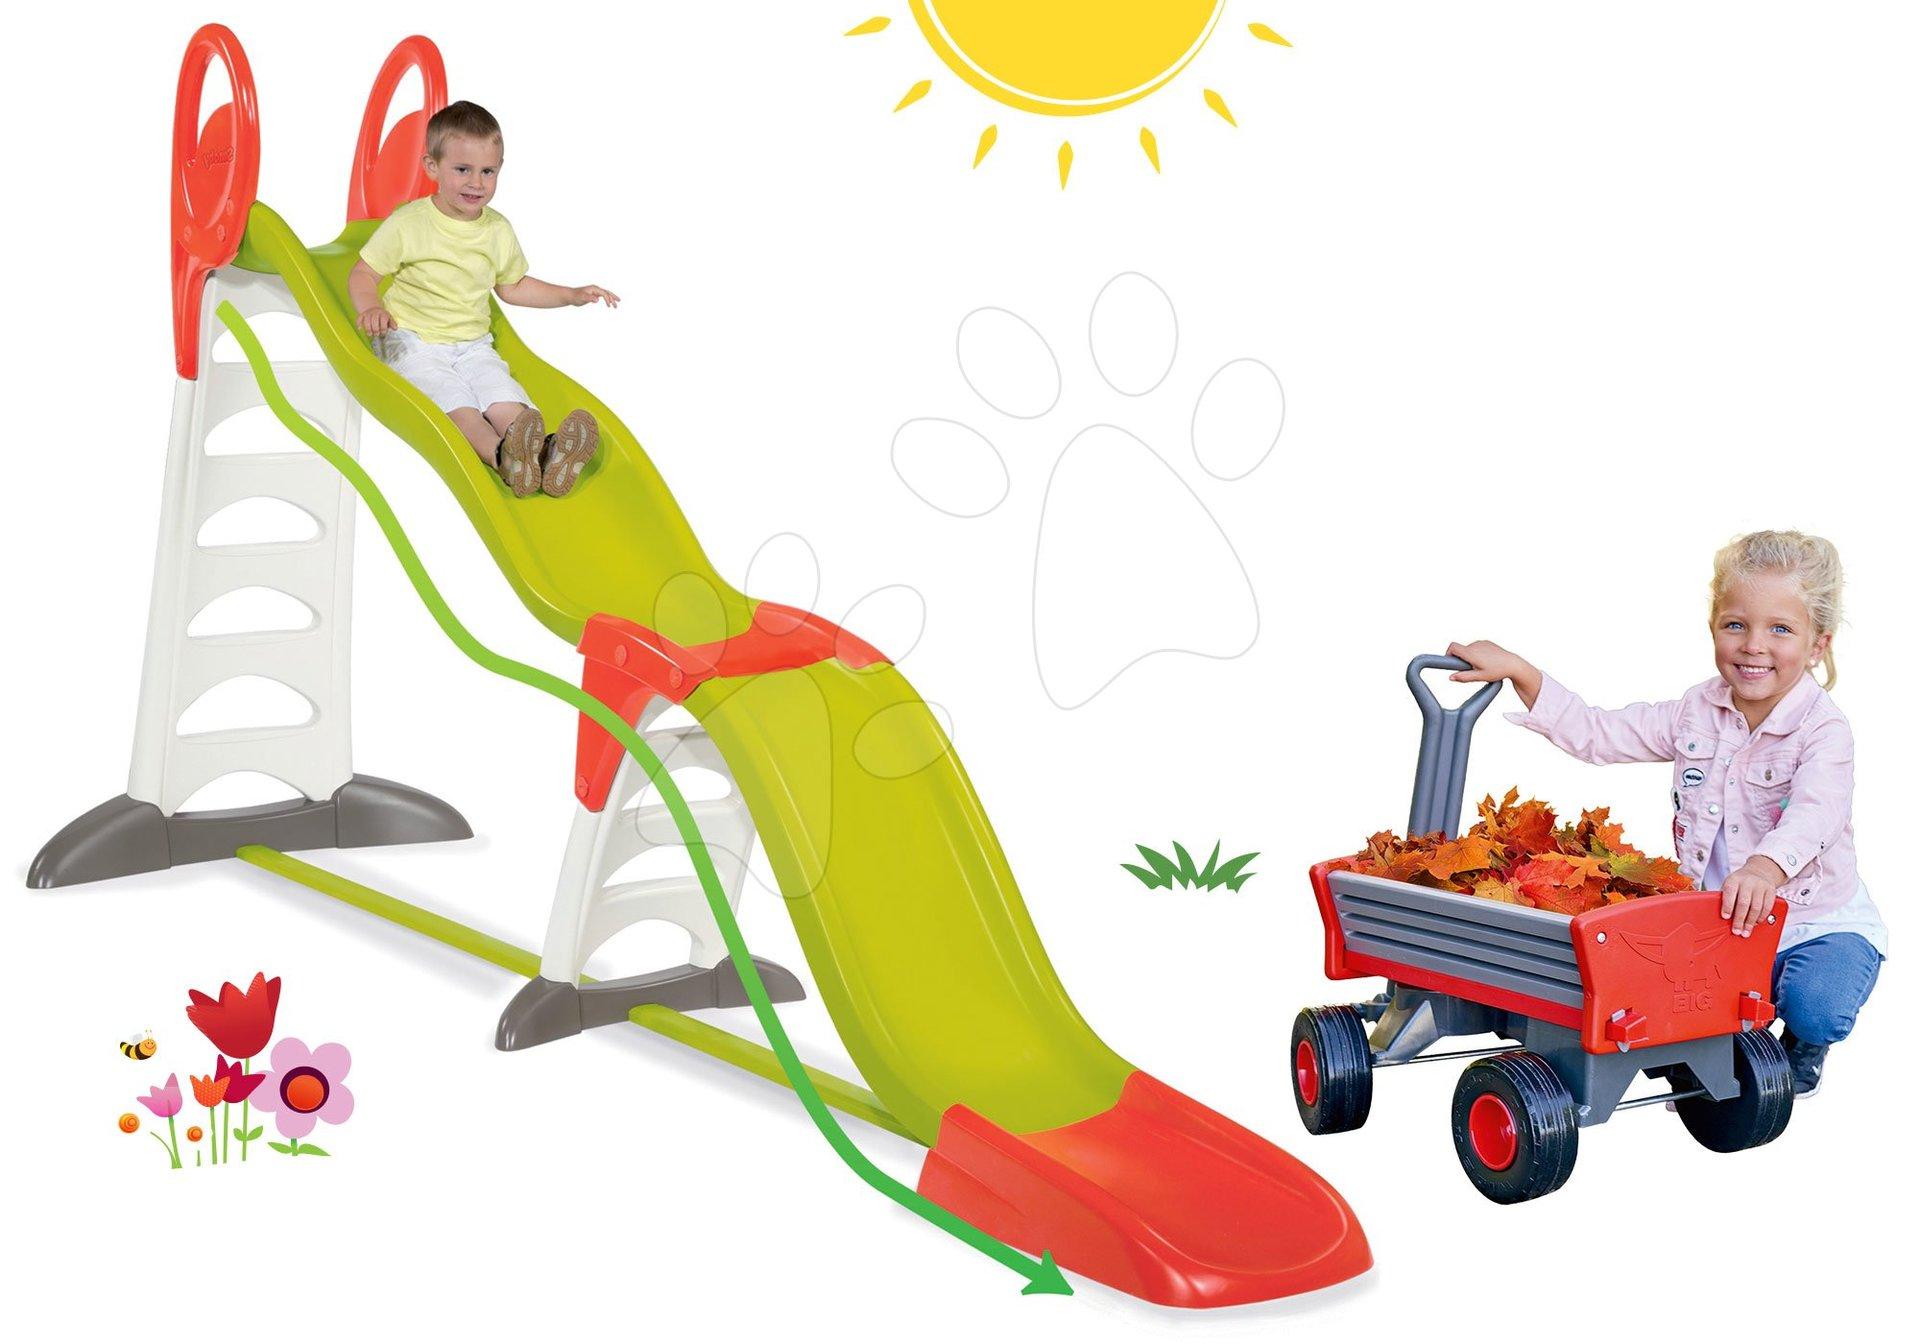 Smoby set detská šmykľavka Toboggan Super Megagliss 2v1 a odrážadlo motorka s gumenými kolesami a zmrzlinou 310260-17